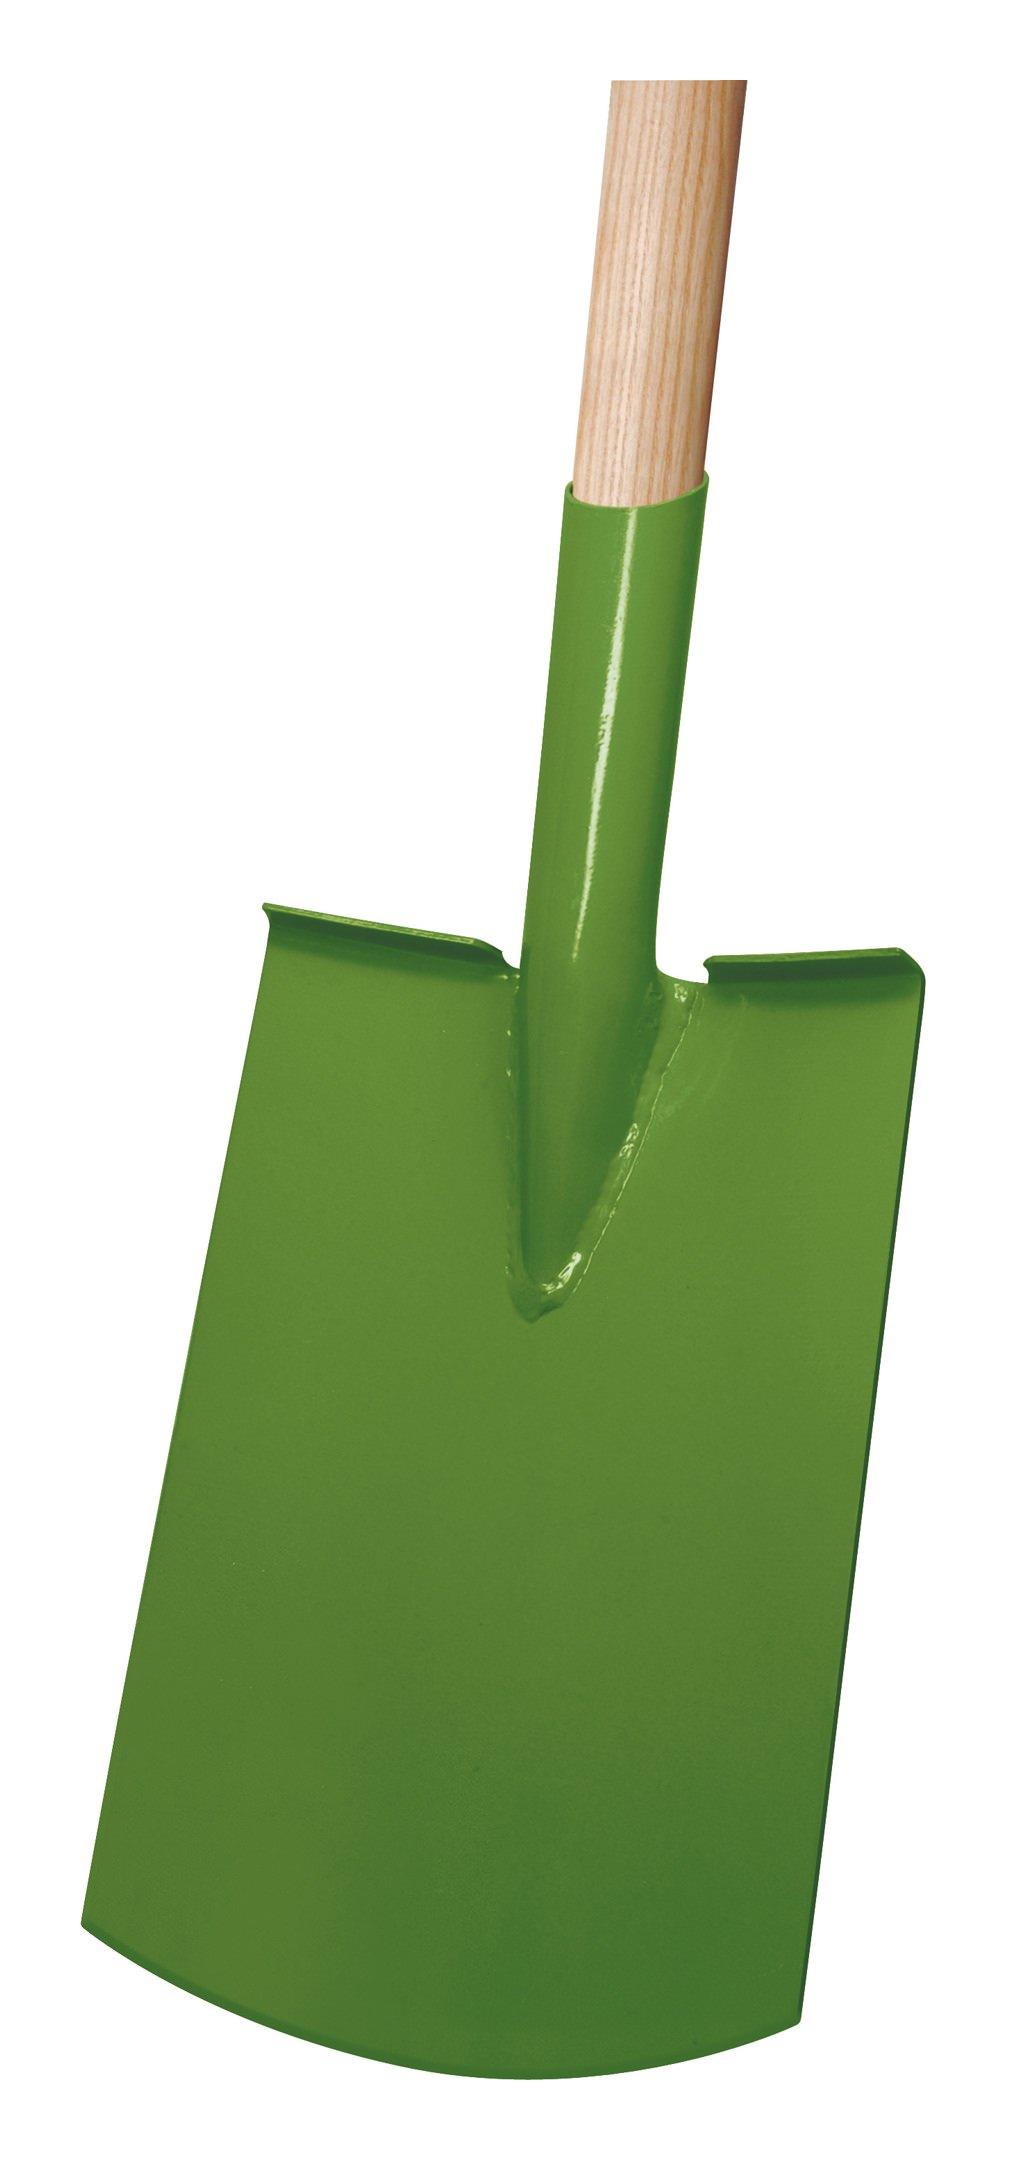 Idealspaten Ideal Damenspaten Rohrdüll grün lackiert - 27300220